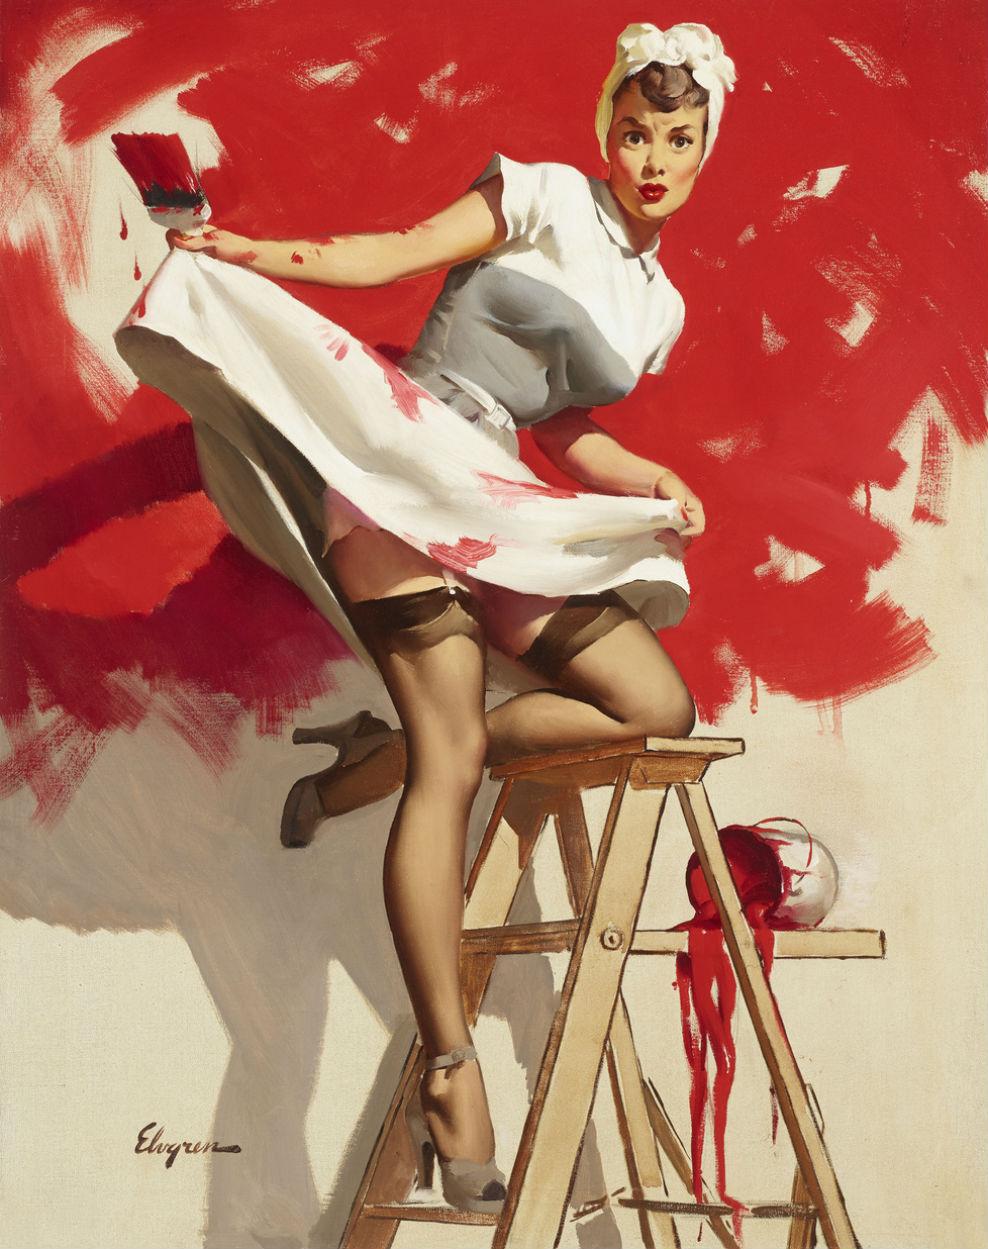 106_1_the_art_of_gil_elvgren_july_2017_gil_elvgren_in_the_red__wright_auction.jpg